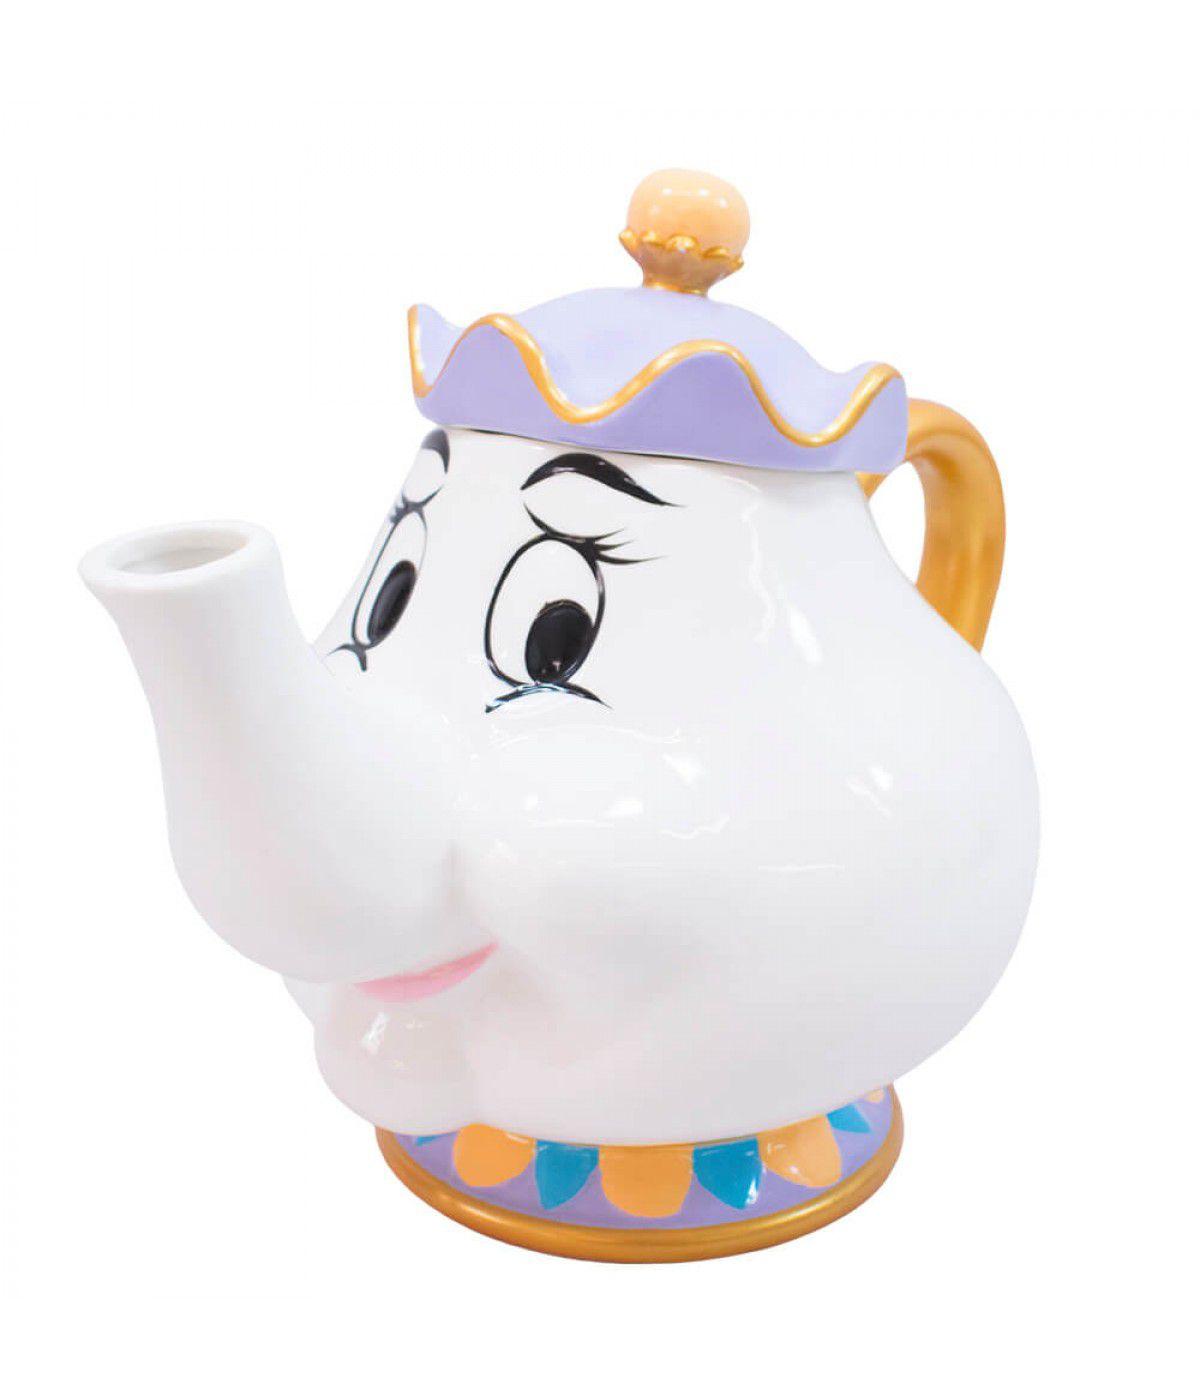 Bule 3D Disney A Bela e a Fera Madame Samovar